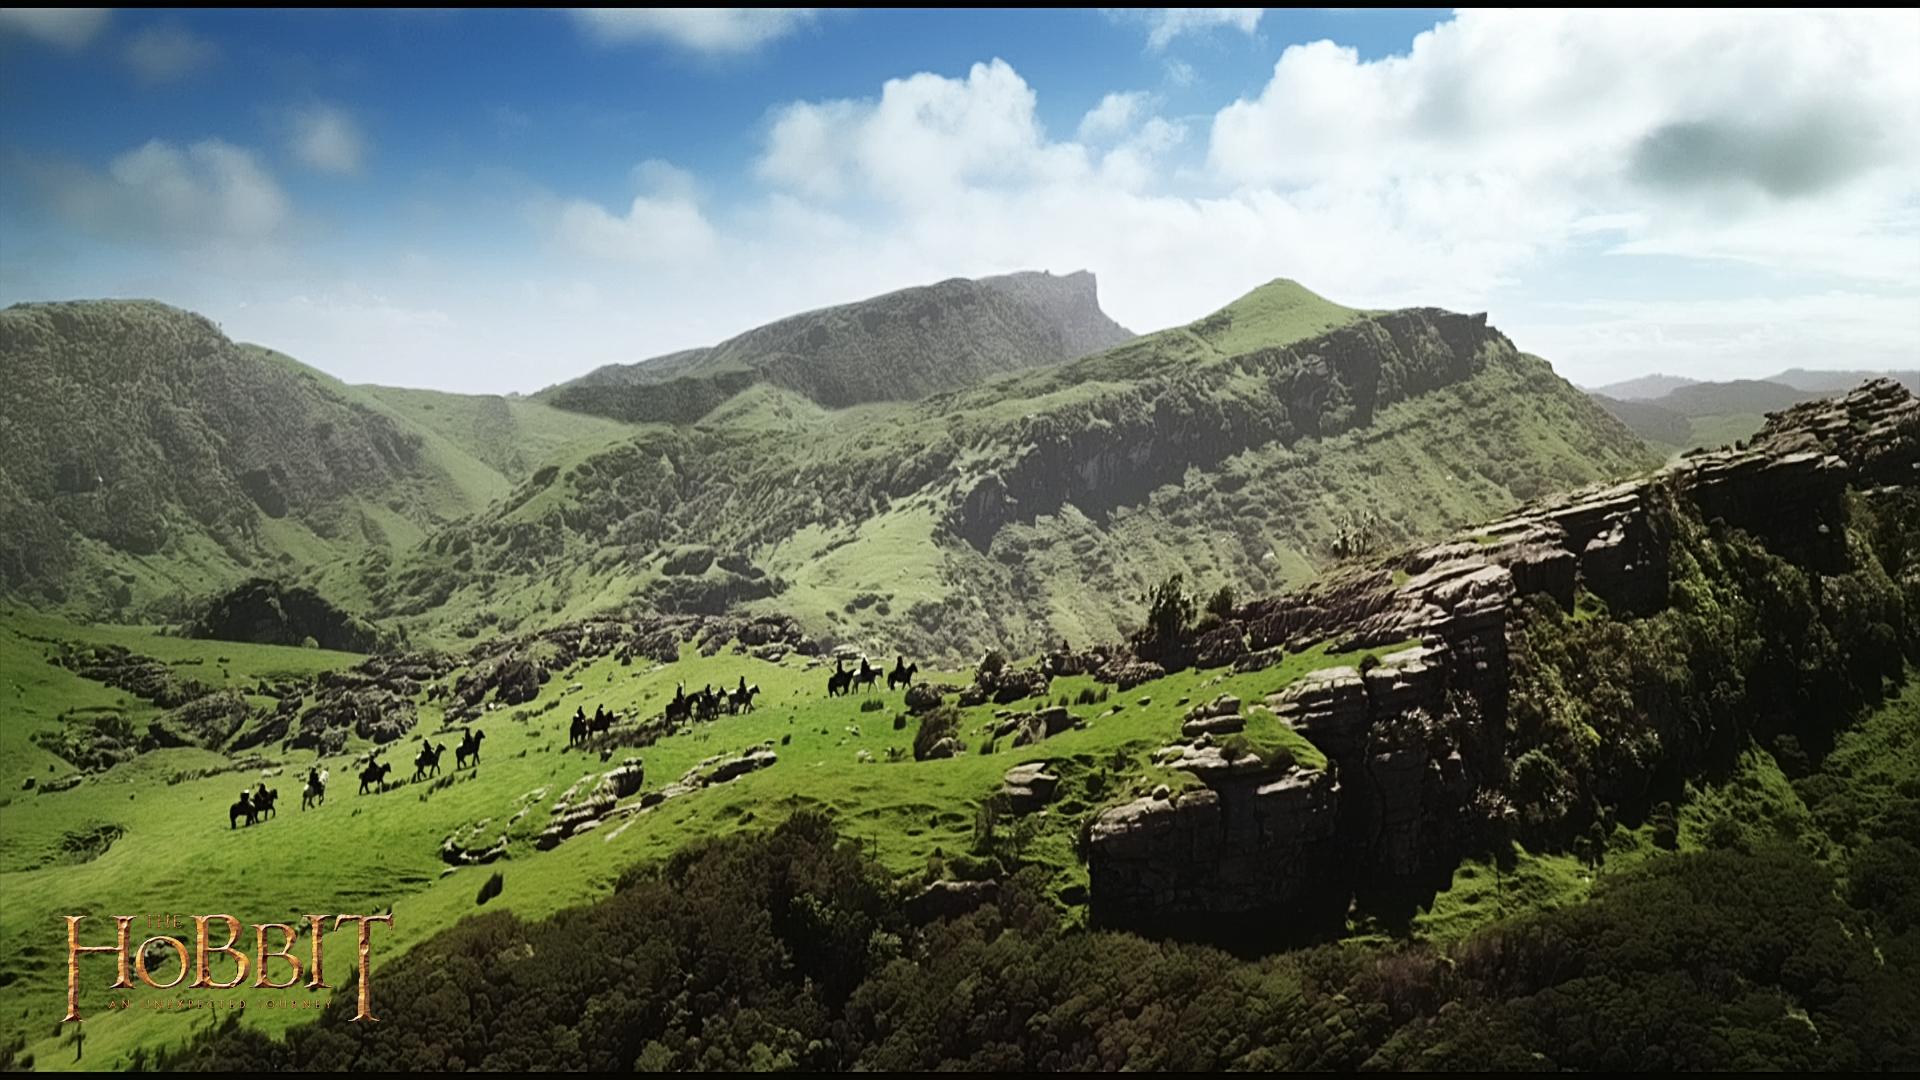 New Movie Wallpaper 1920x1080 The Hobbit Landscape desktop PC and 1920x1080